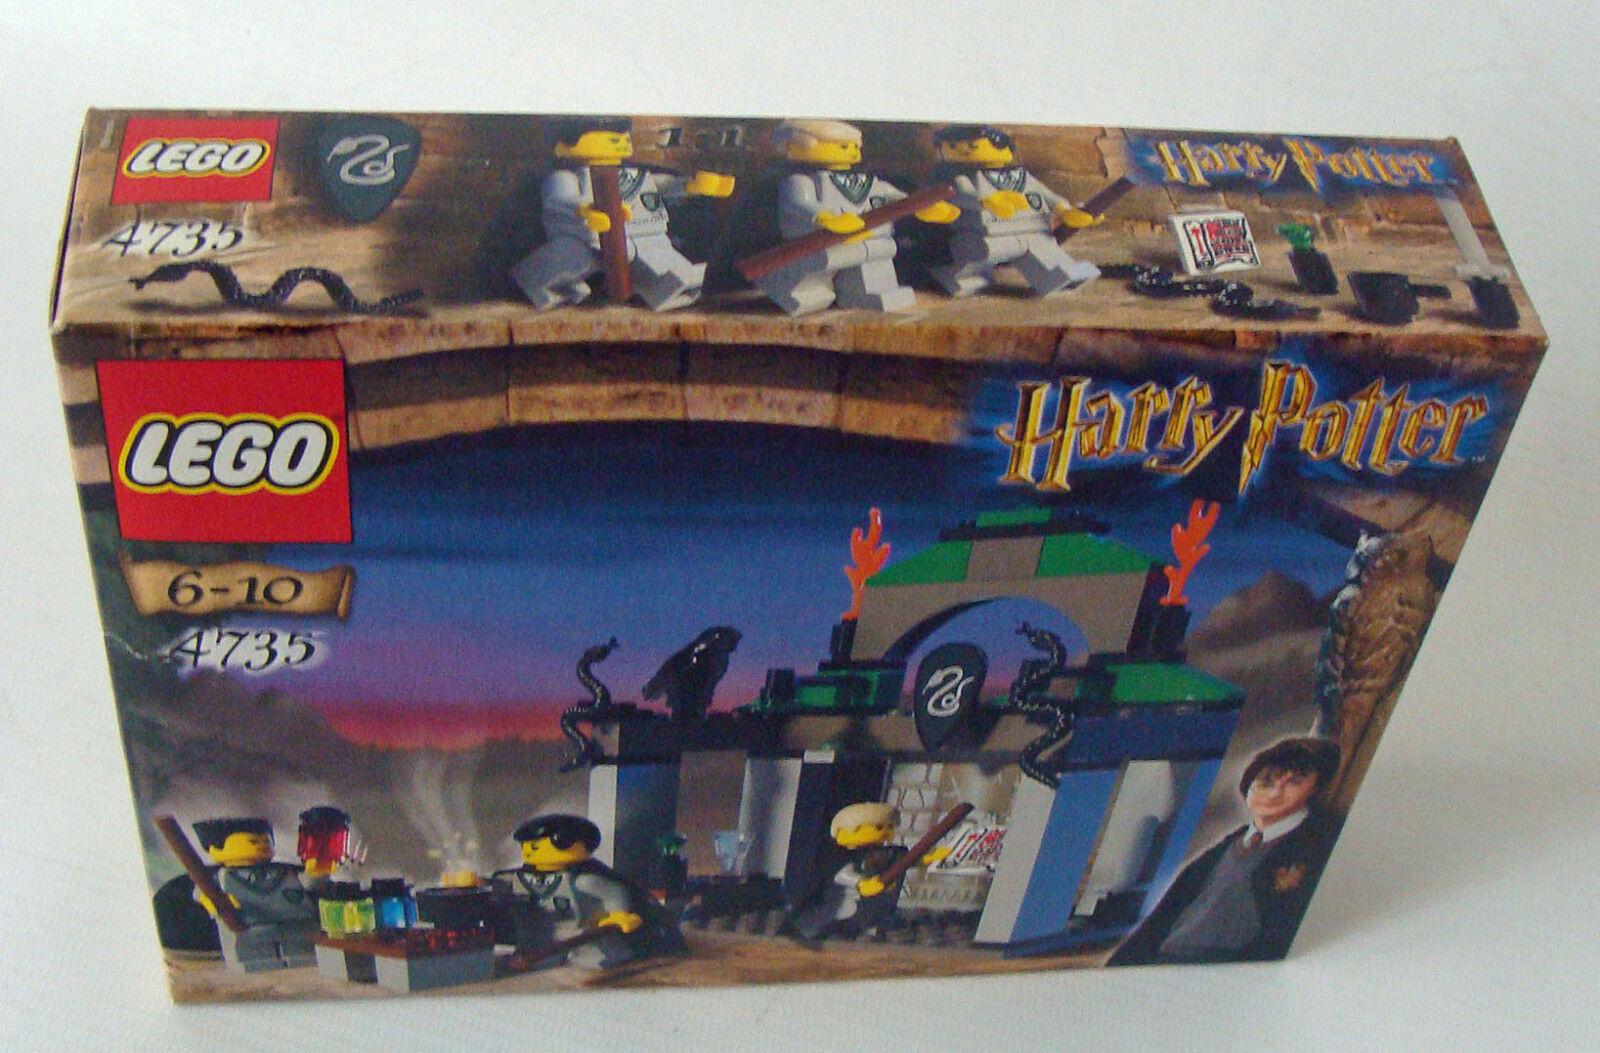 Lego® Harry Potter 4735 - Slytherin 90 Teile 6-10 Jahren - Neu